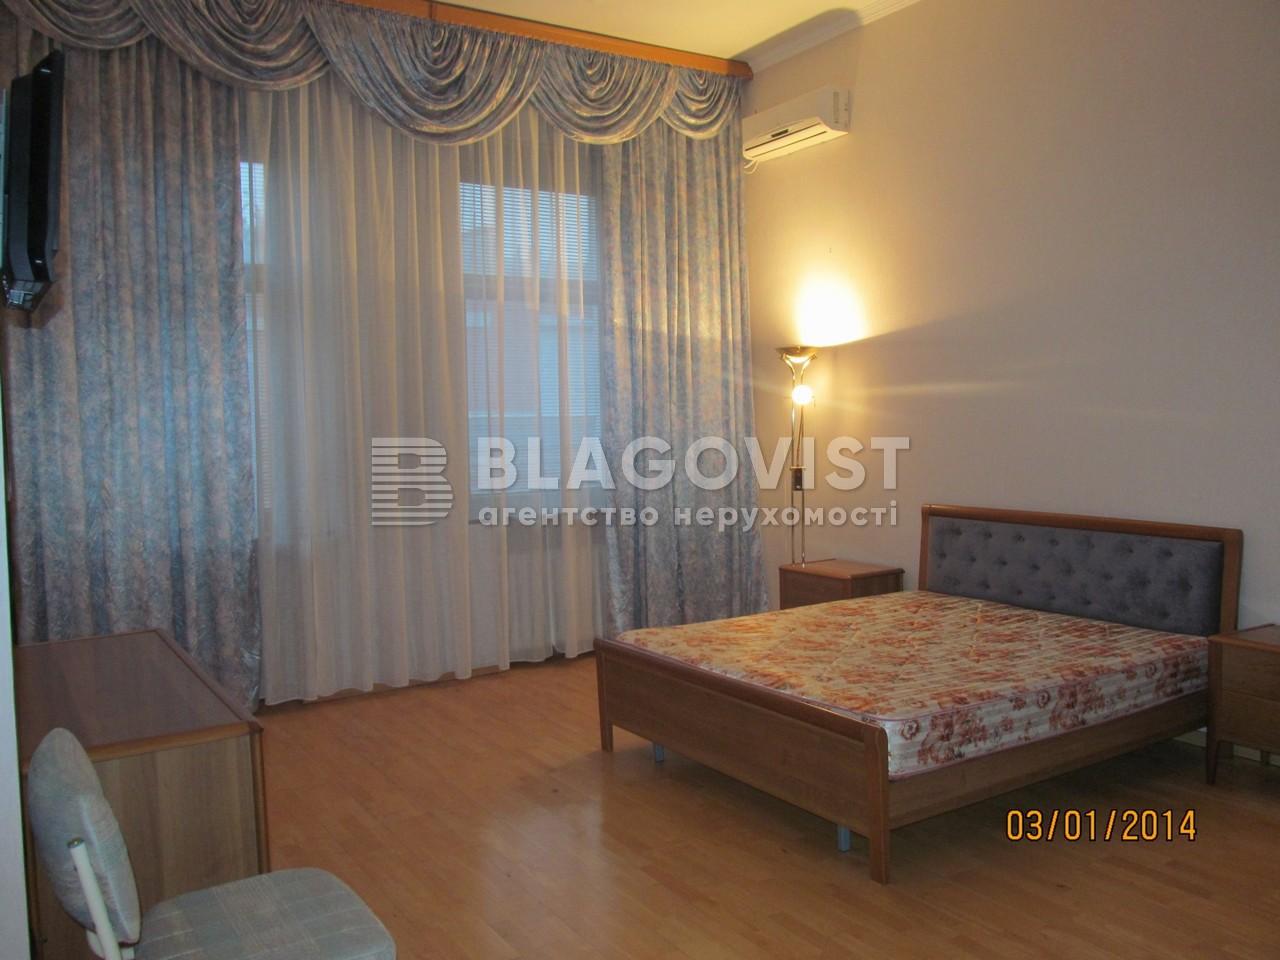 Квартира G-12026, Городецкого Архитектора, 11б, Киев - Фото 8